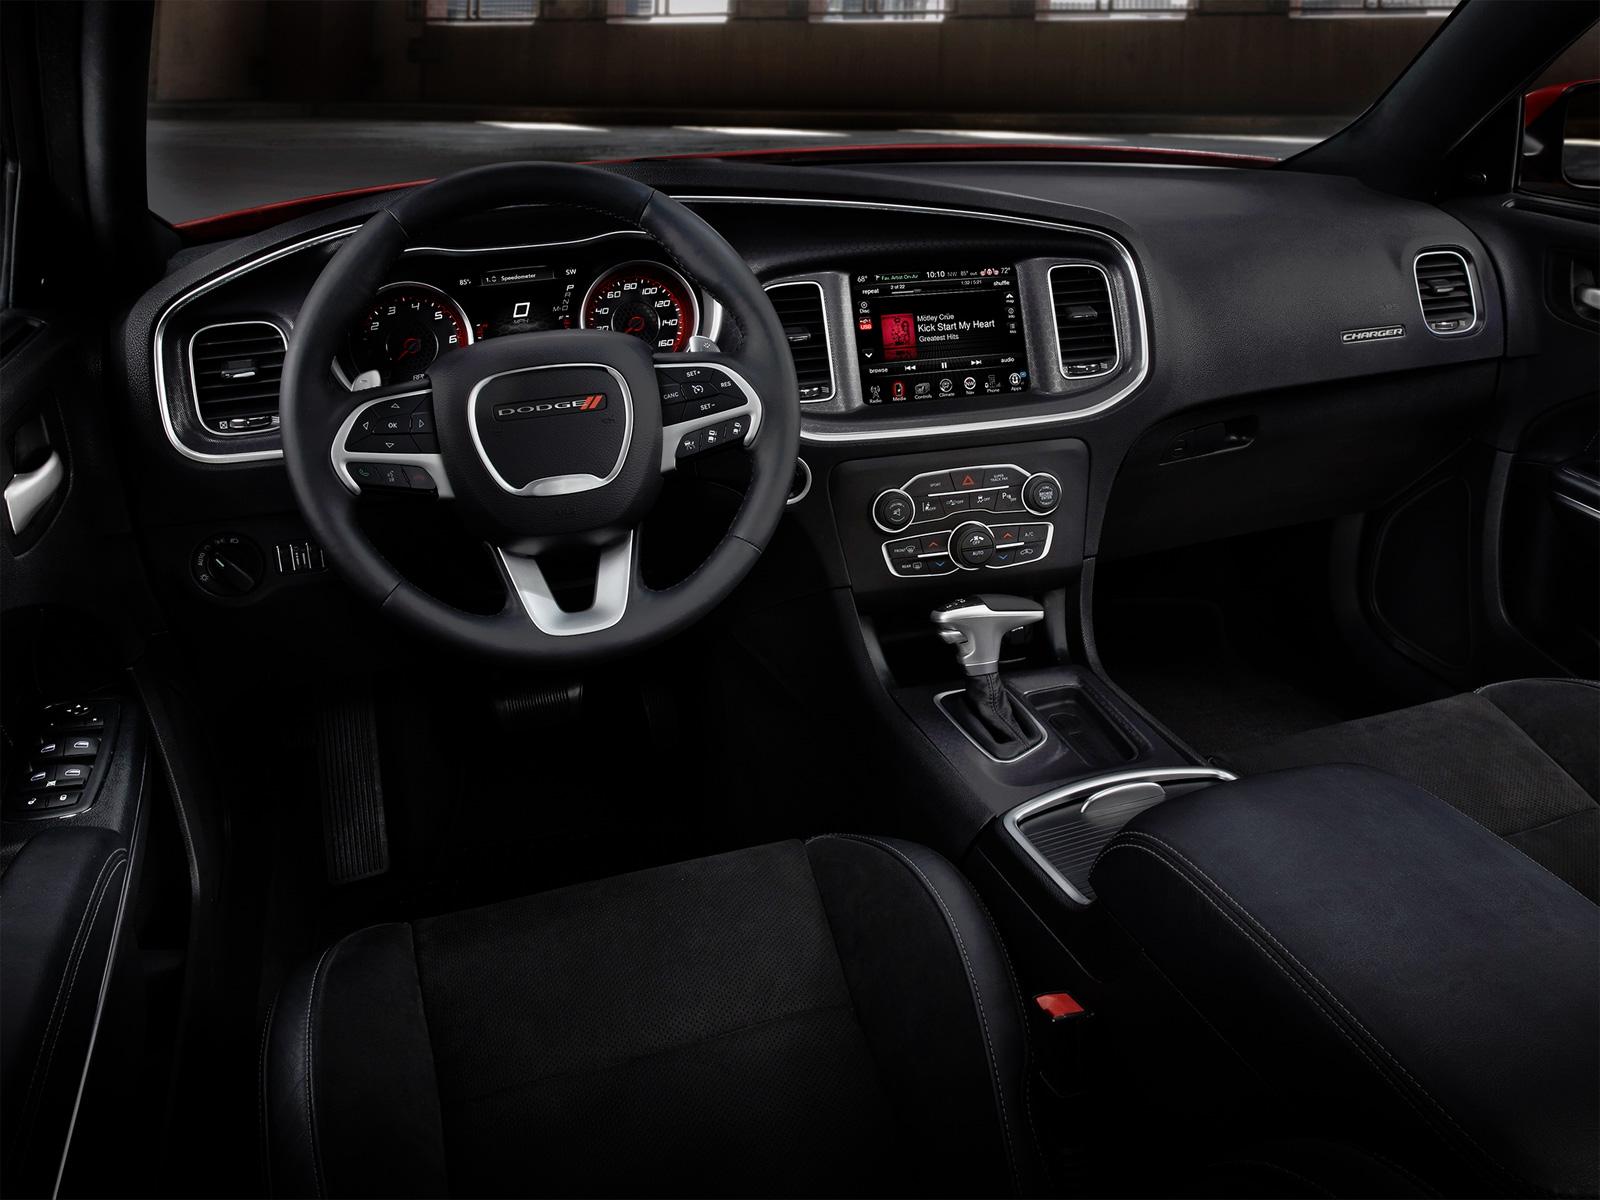 Картинки по запросу Dodge Charger GT 2020 салон